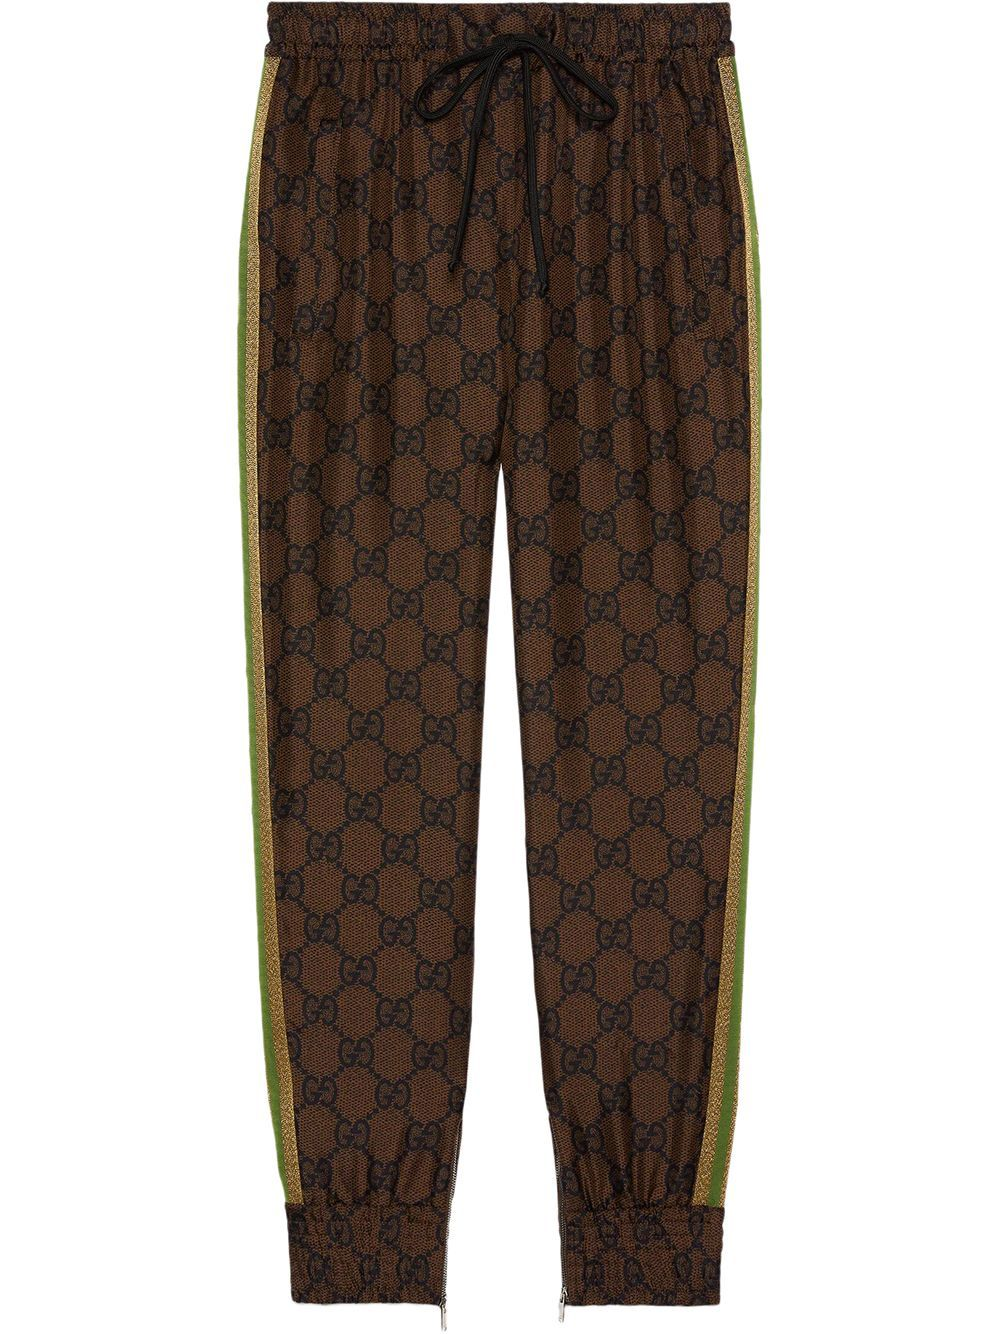 Pantalone gg supreme in misto seta